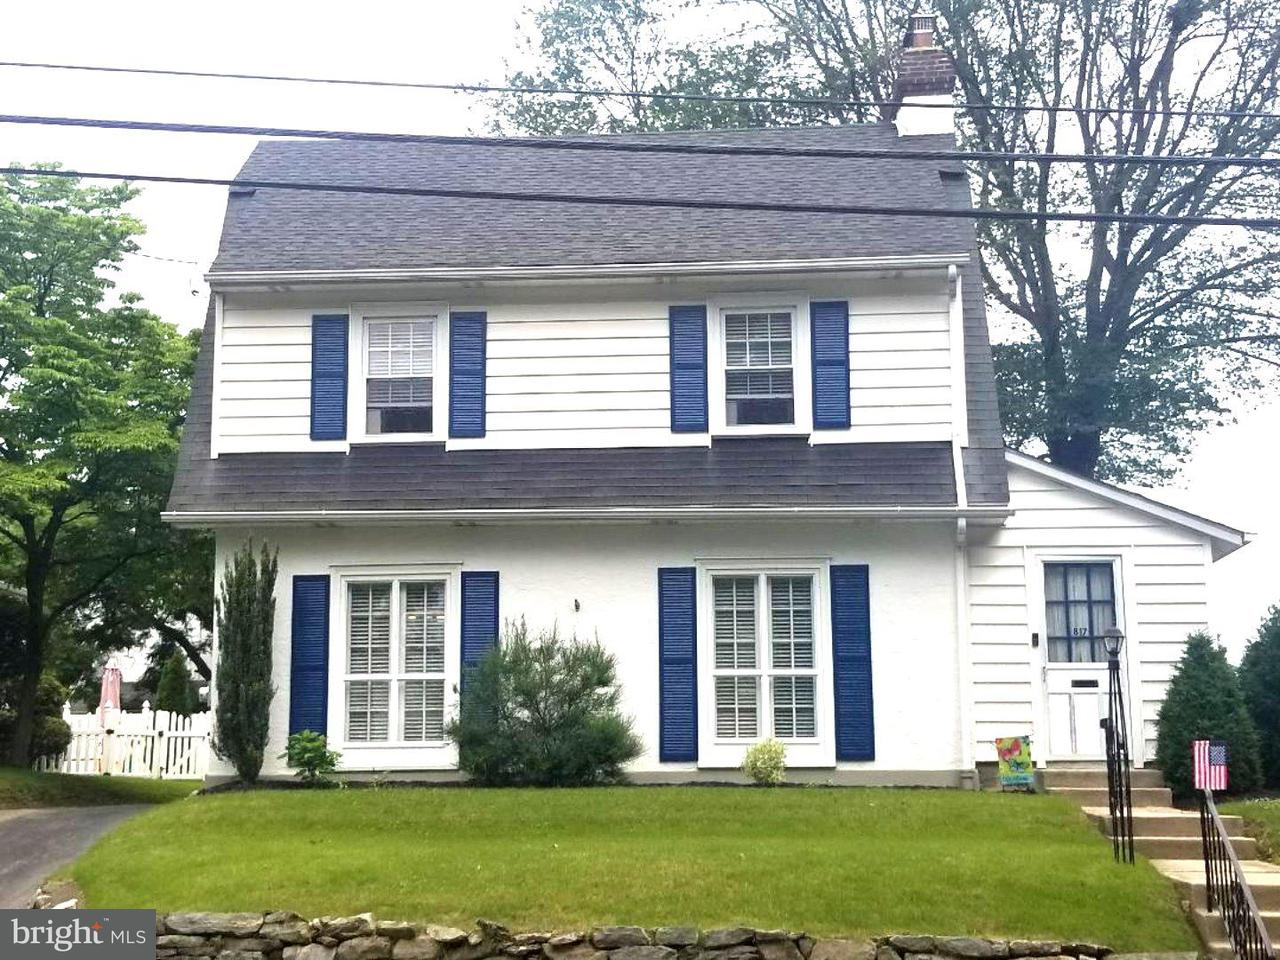 817  Edmonds Drexel Hill, PA 19026